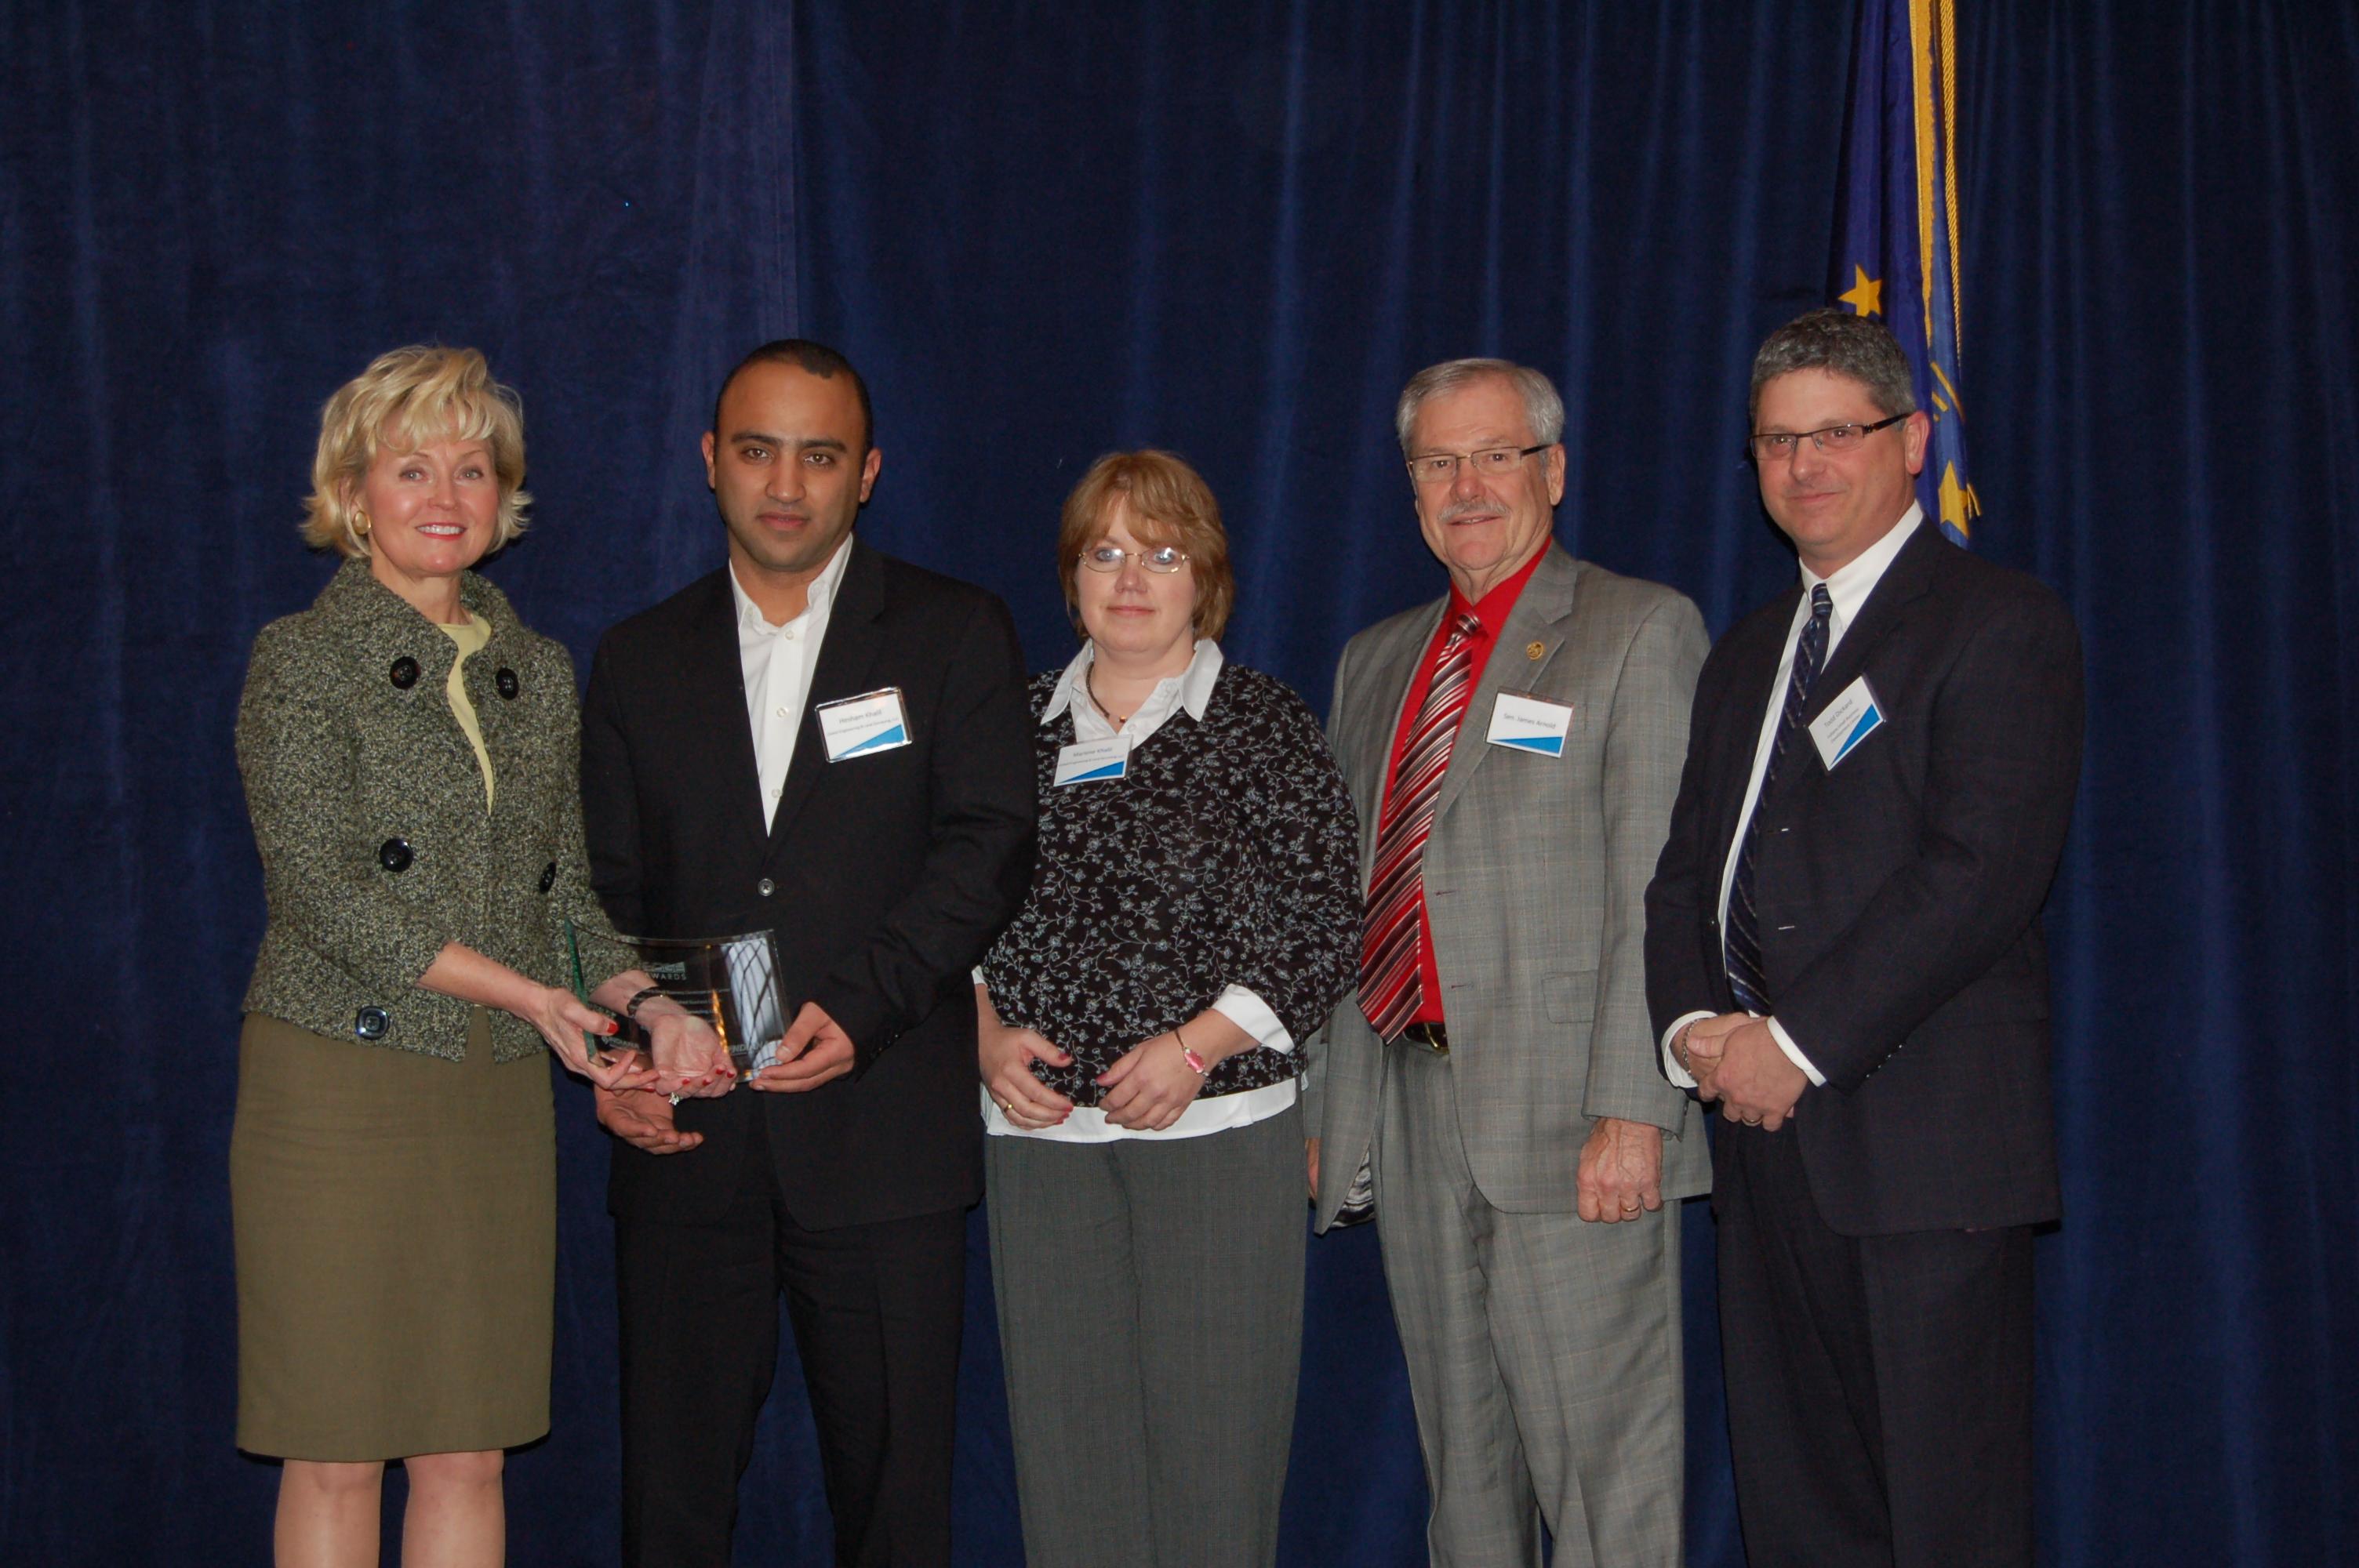 2010 EDGE Award Winners Global Land Surveying, LLC.